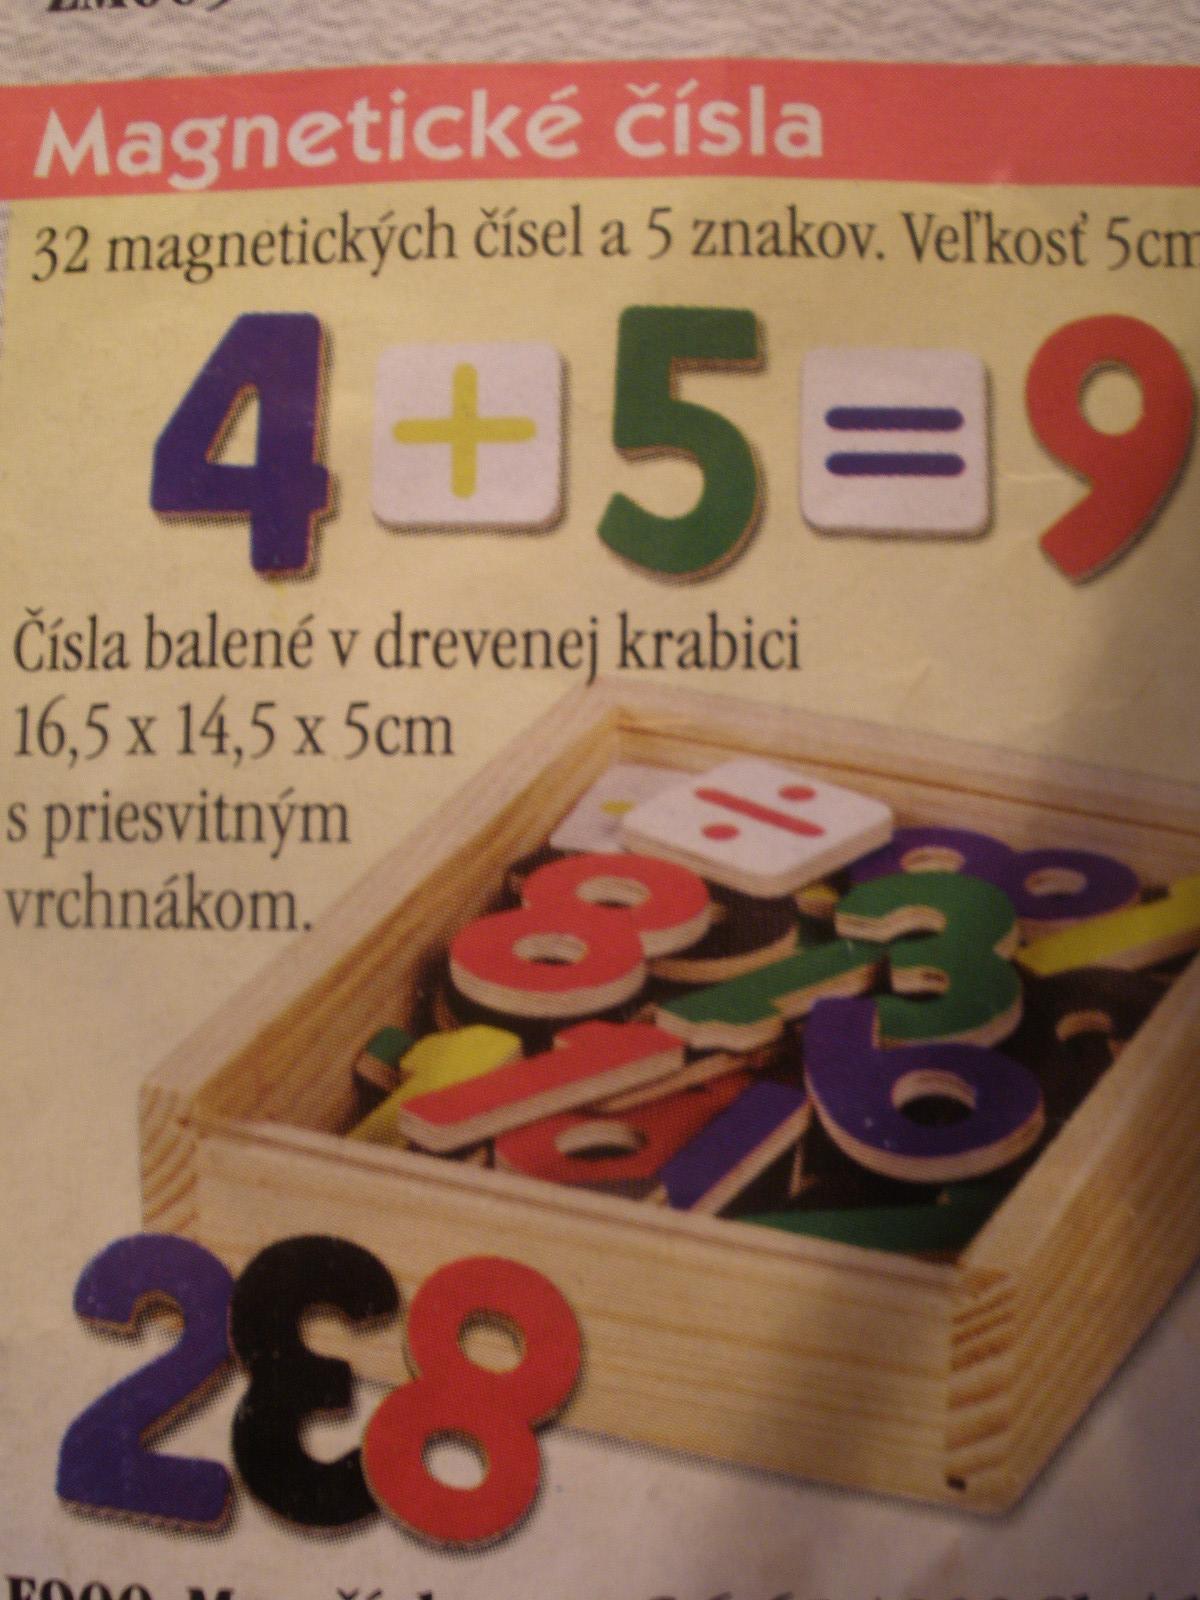 Magnetické čísla k magnetickej tabuľi